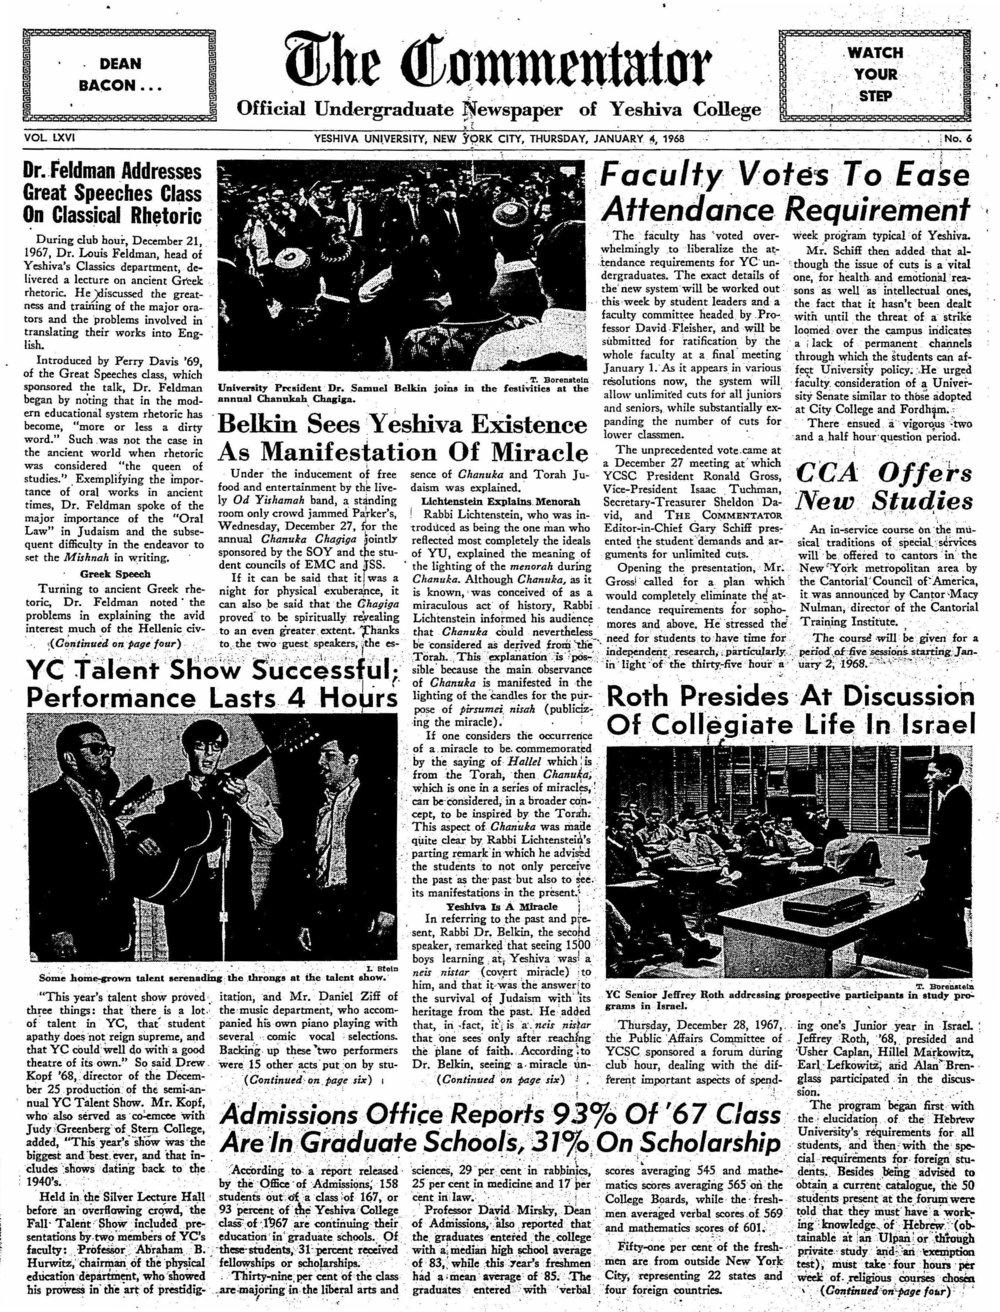 1968.1.4.TC--Dr. Feldman Addresses Great Speeches Class on Classical Rhetoric_Page_1.jpg